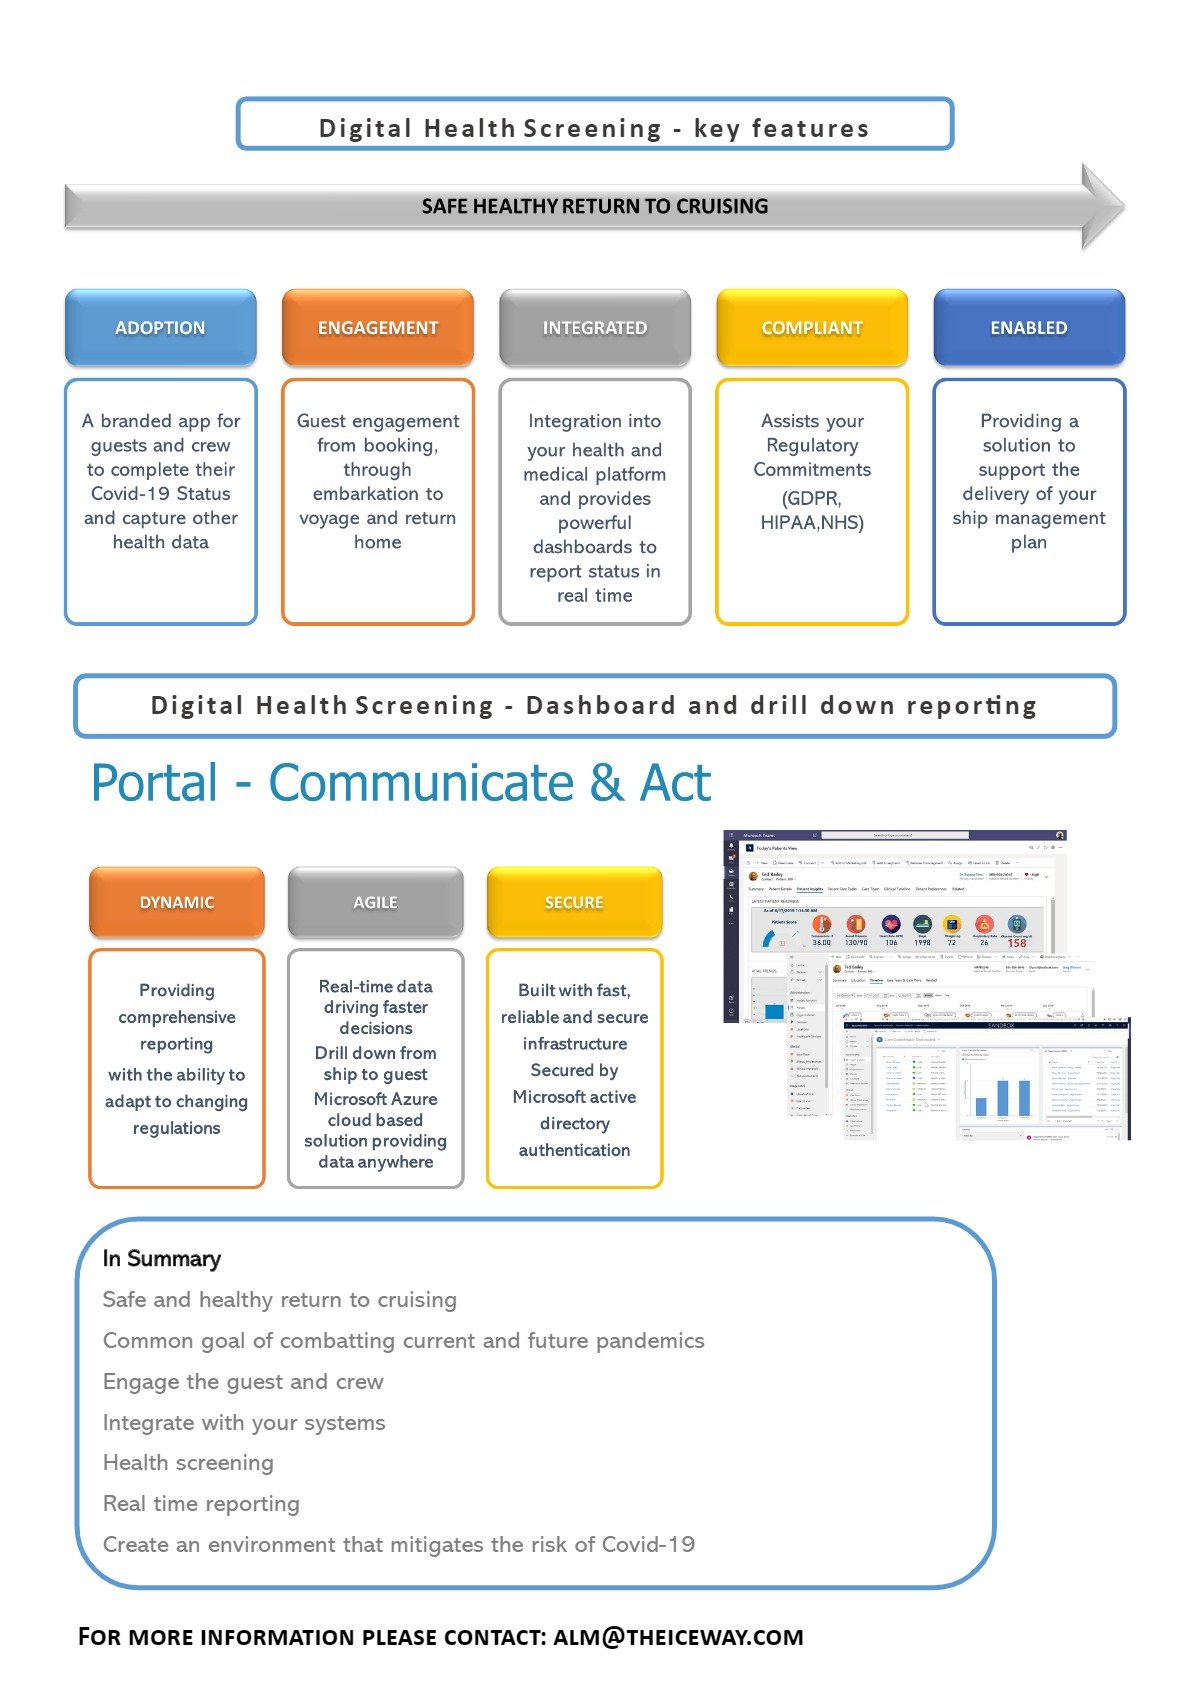 Digital Health Screening - Key Features